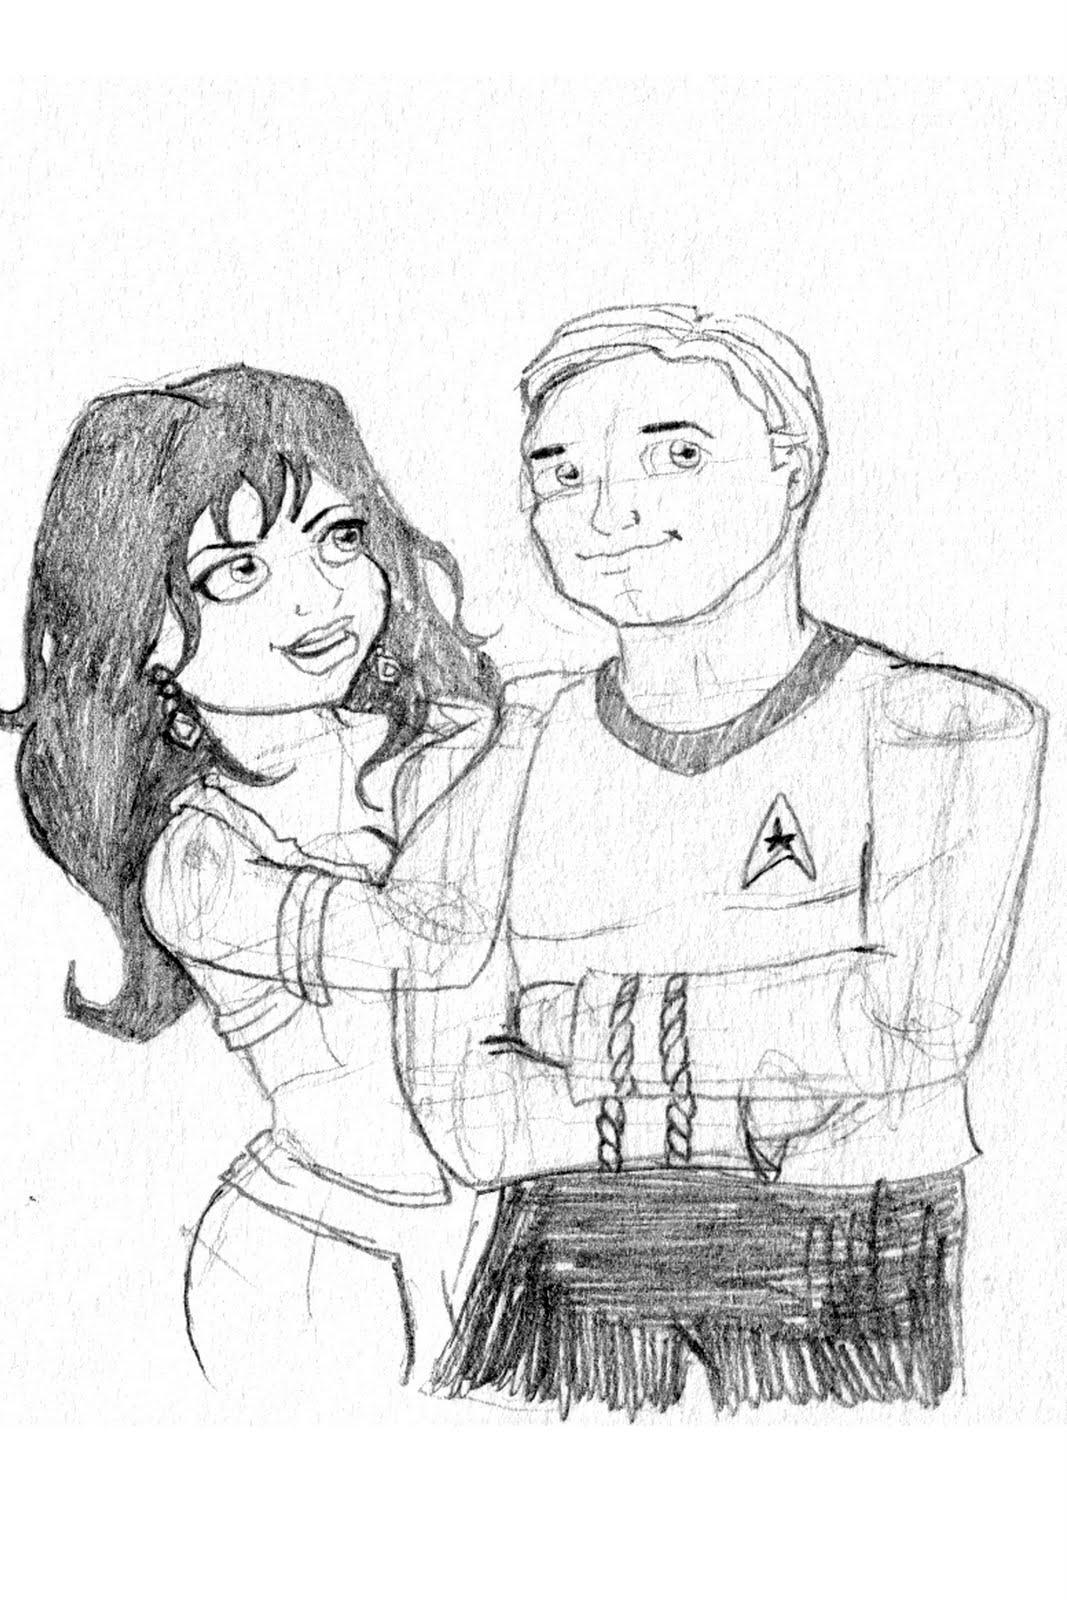 Steve Coffin Daily Sketch Blog: June 2011